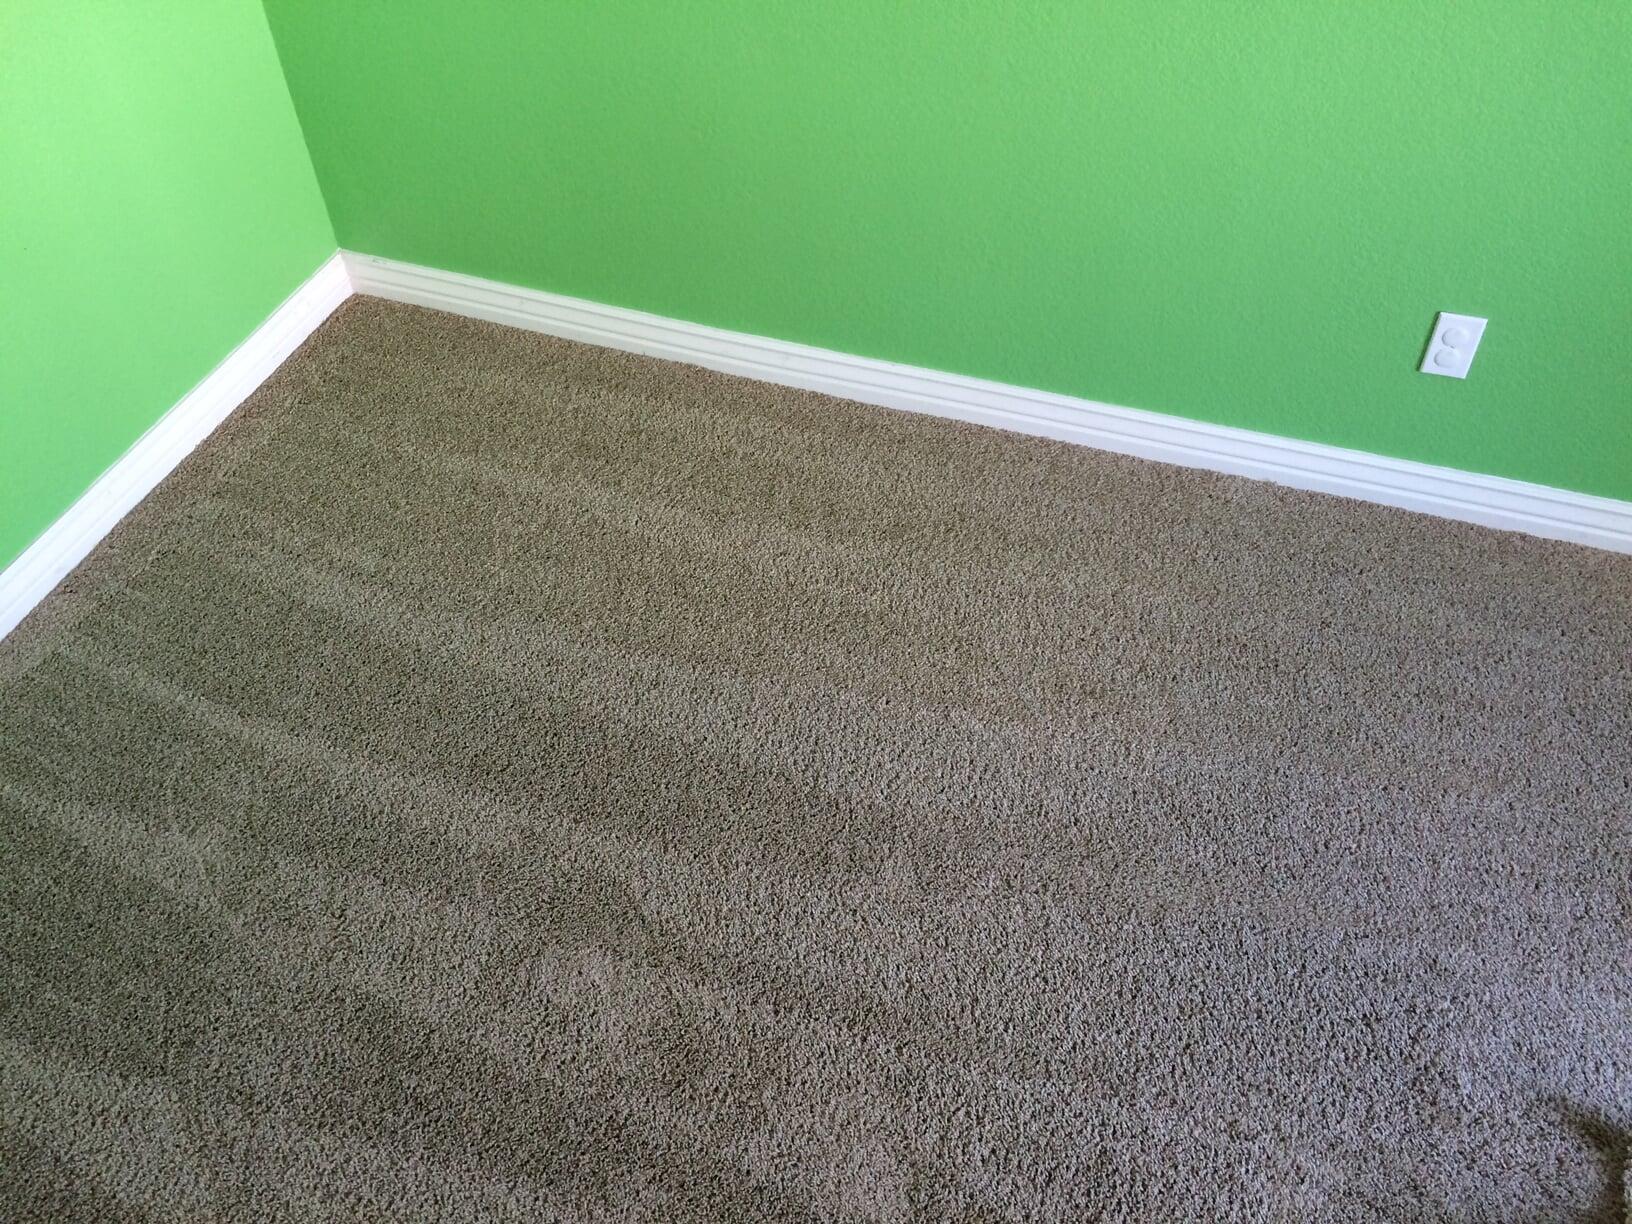 New carpet flooring installation in Sun City, AZ from Cornerstone Flooring Brokers